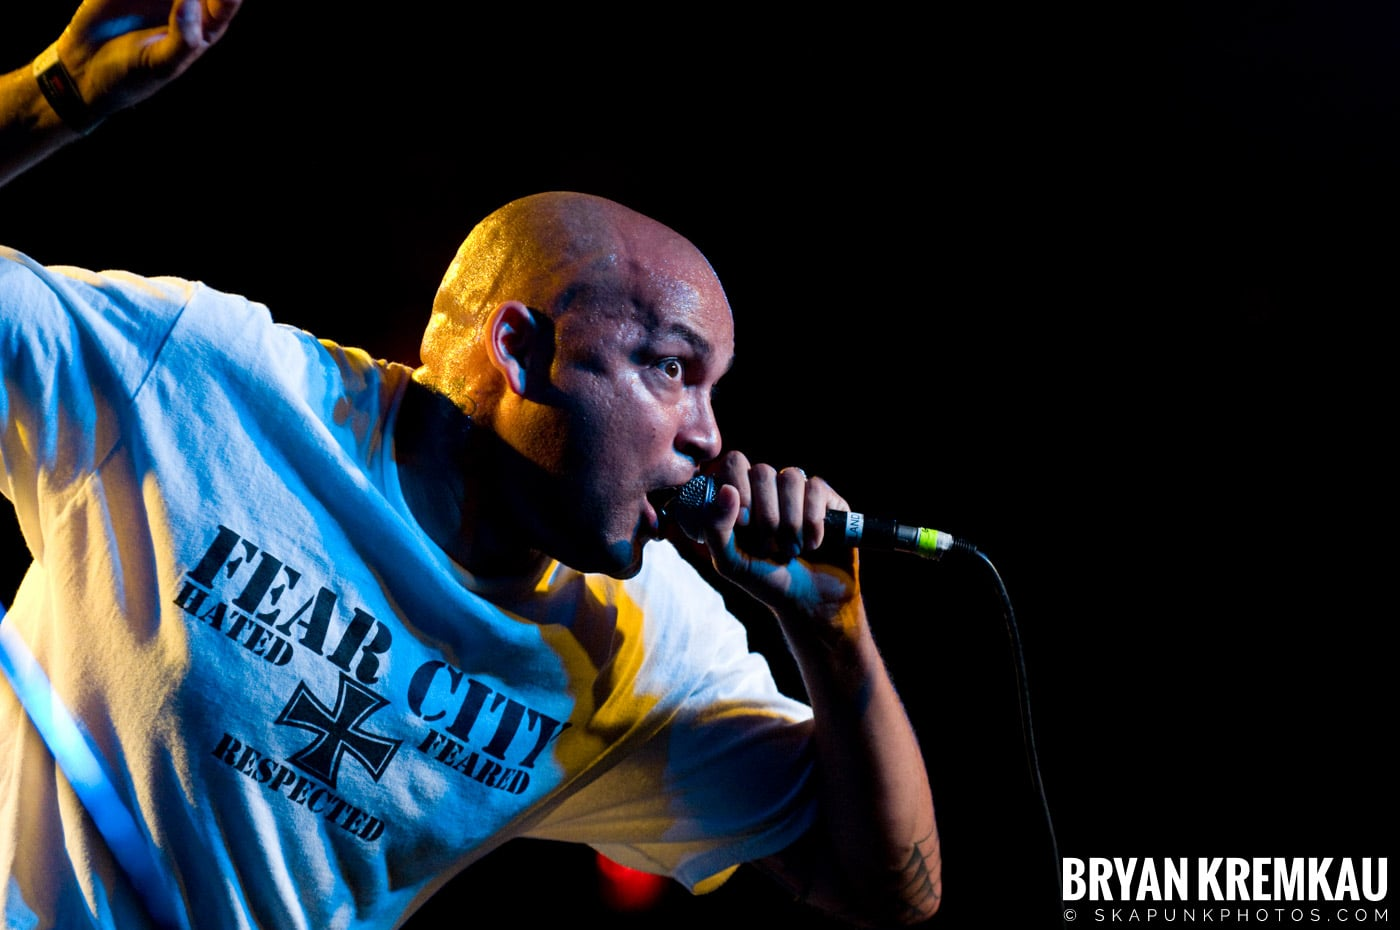 Hub City Stompers (Ska is Dead Tour) @ Starland Ballroom, Sayreville, NJ - 11.15.09 (2)